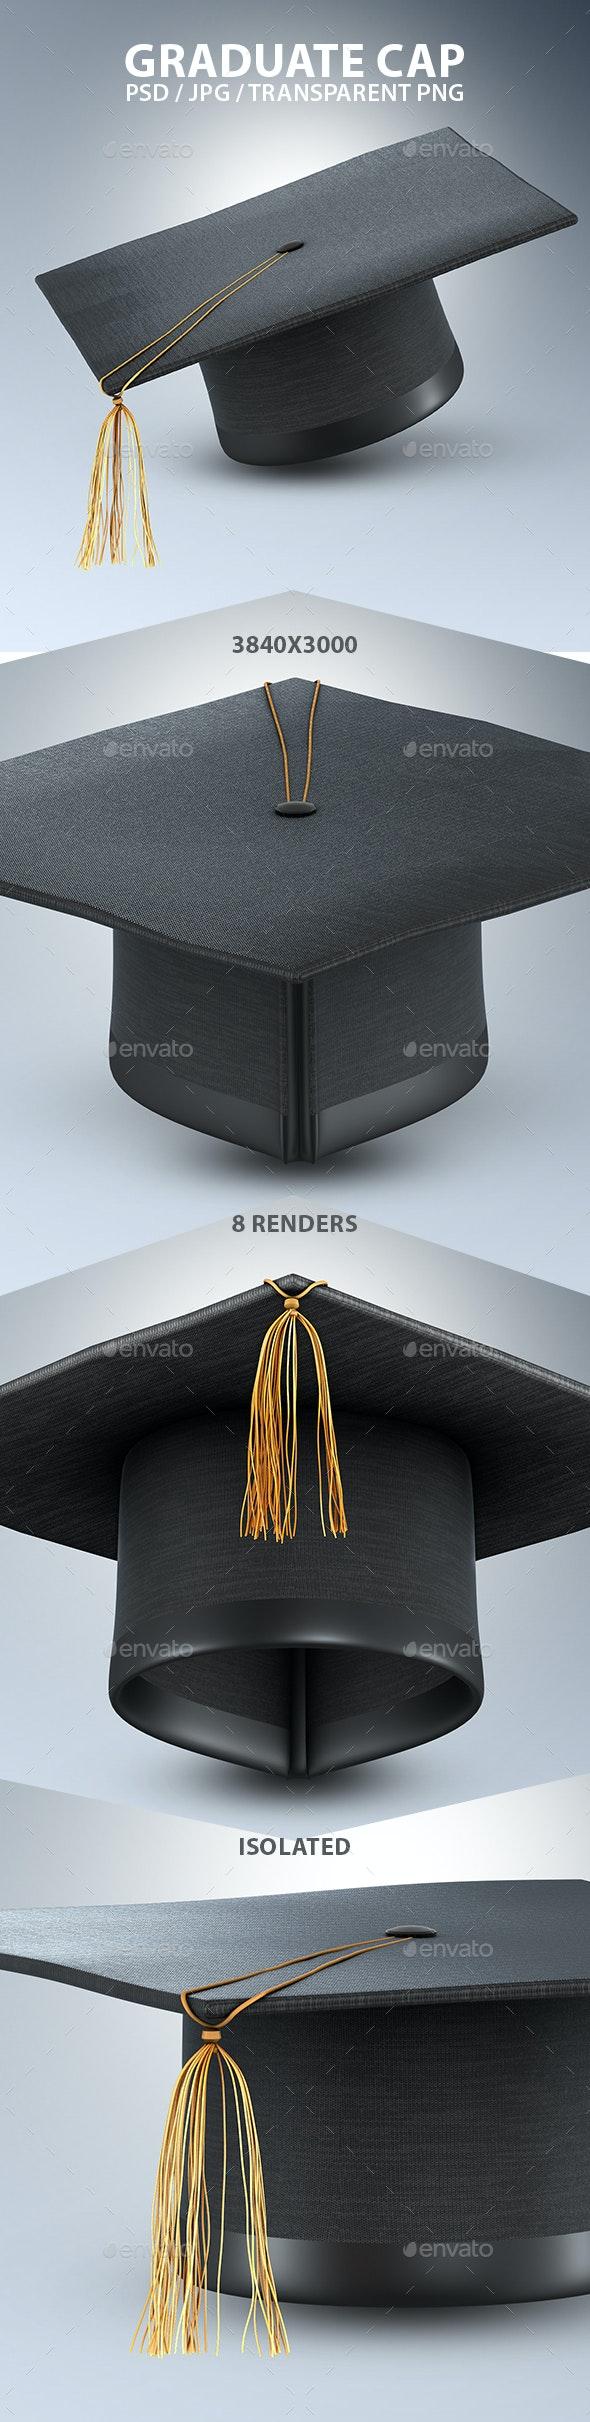 Graduate Cap 3D Renders - Objects 3D Renders